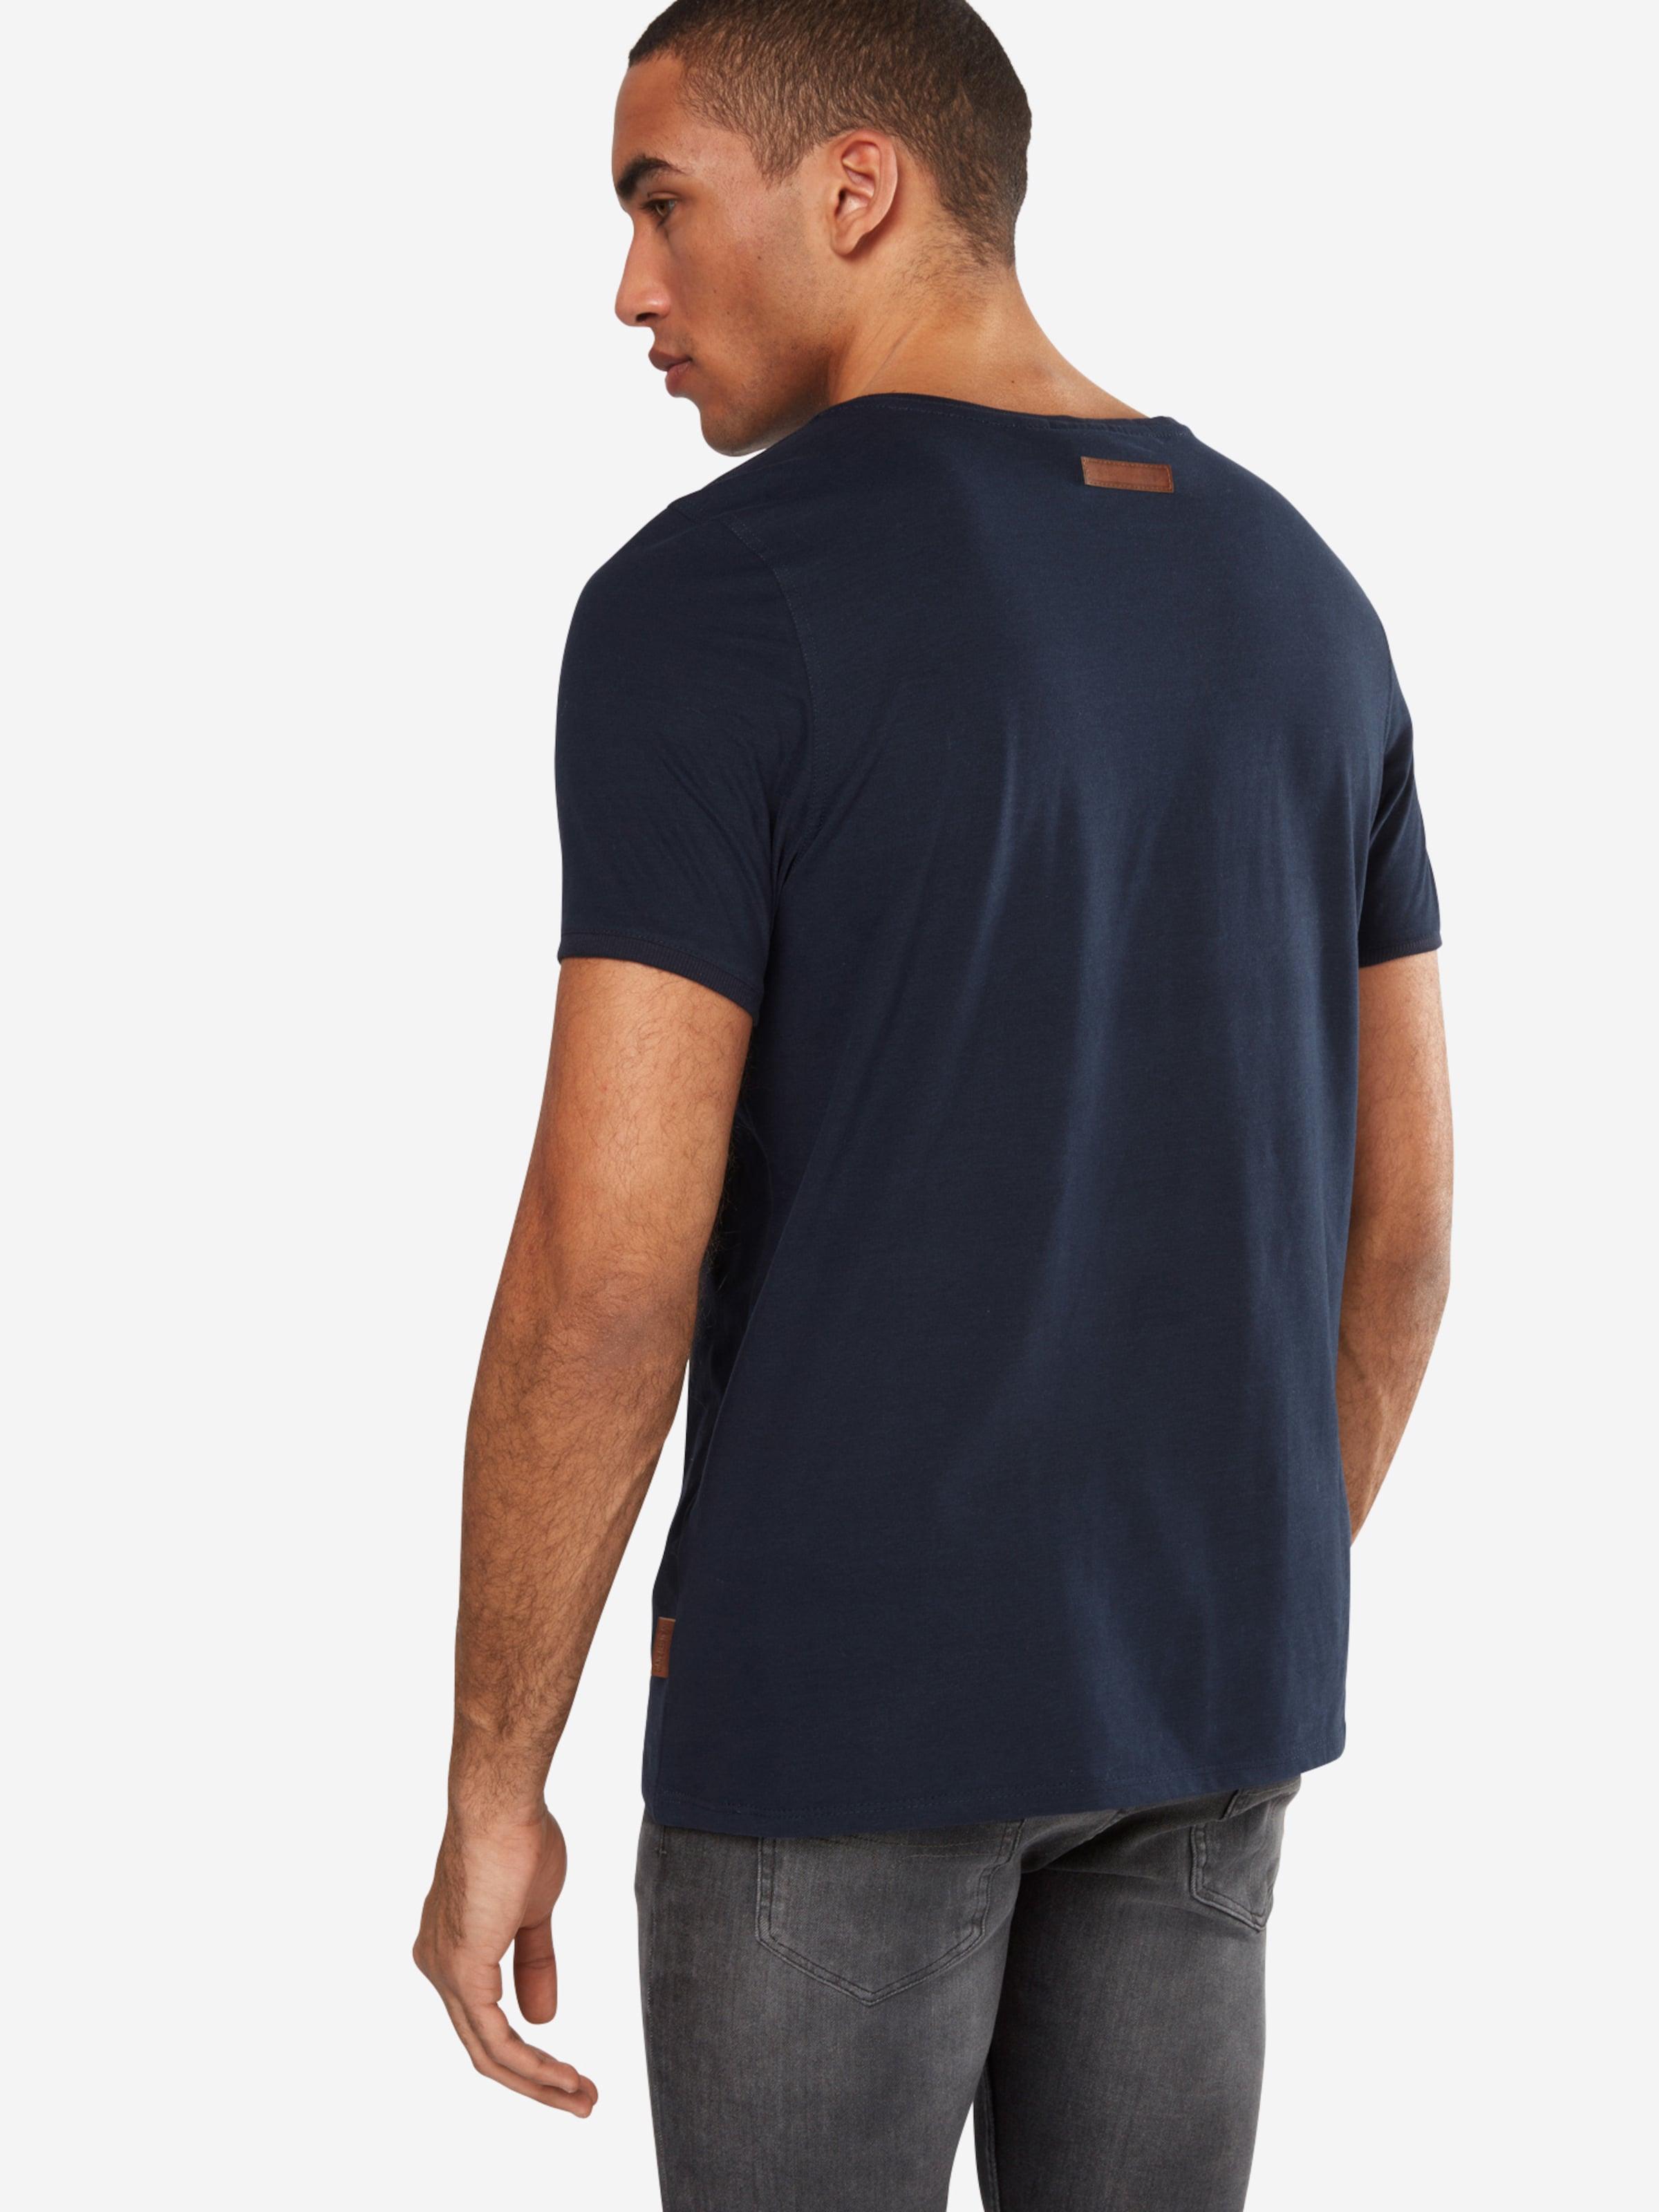 naketano naketano Shirt T Shirt naketano Shirt naketano naketano T T Shirt T T Shirt qPOxAHtf